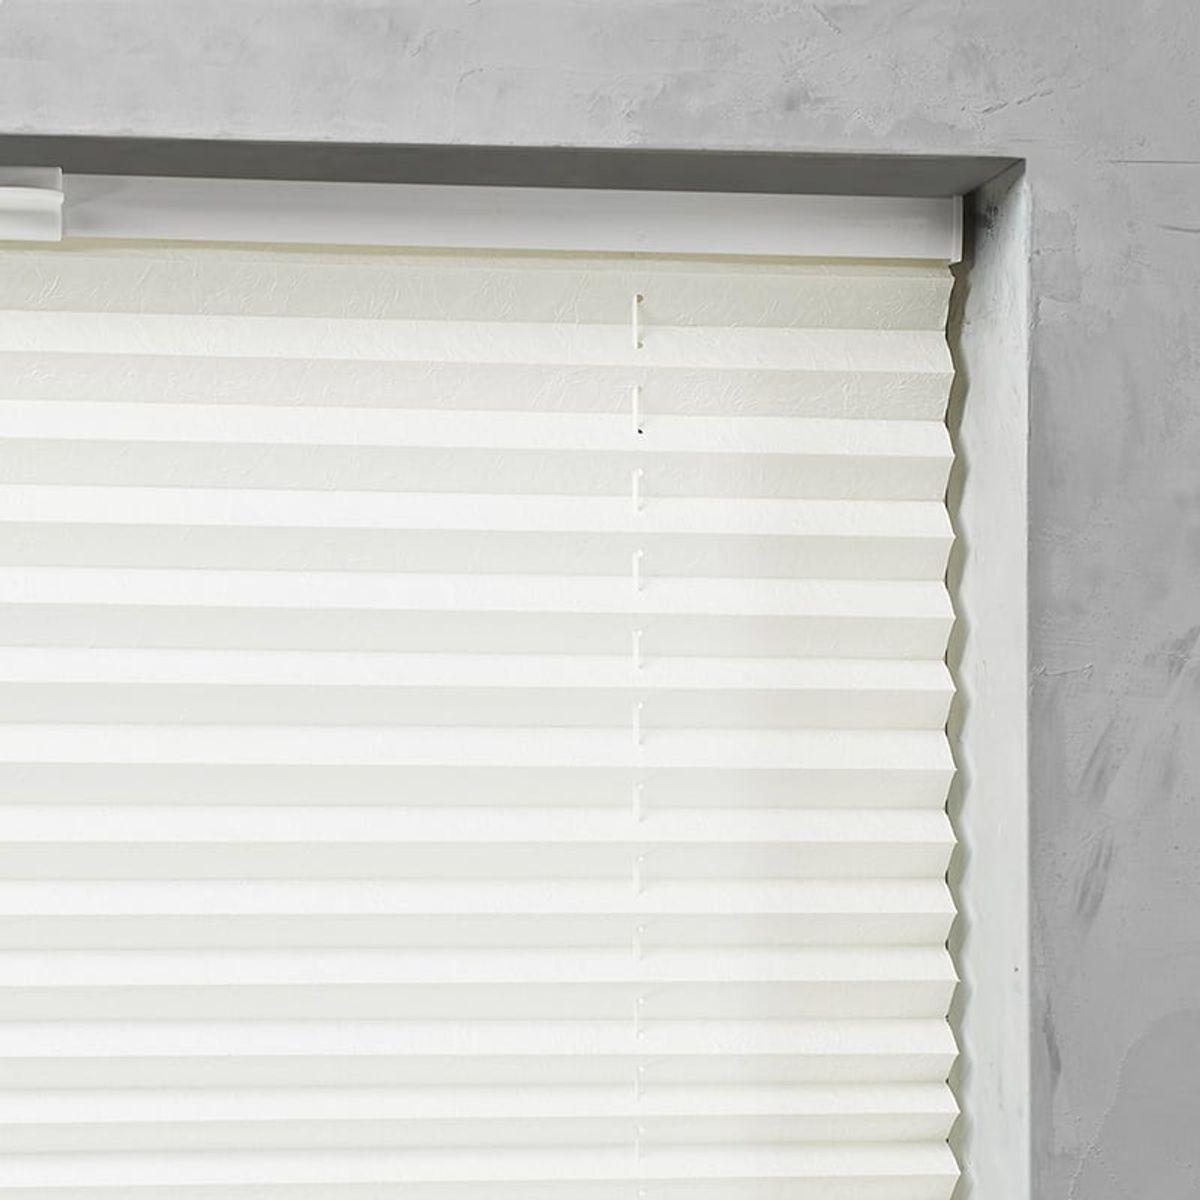 Plisségordijn gespannen - Lichtdoorlatend - Gebroken wit - 115cm x 130cm